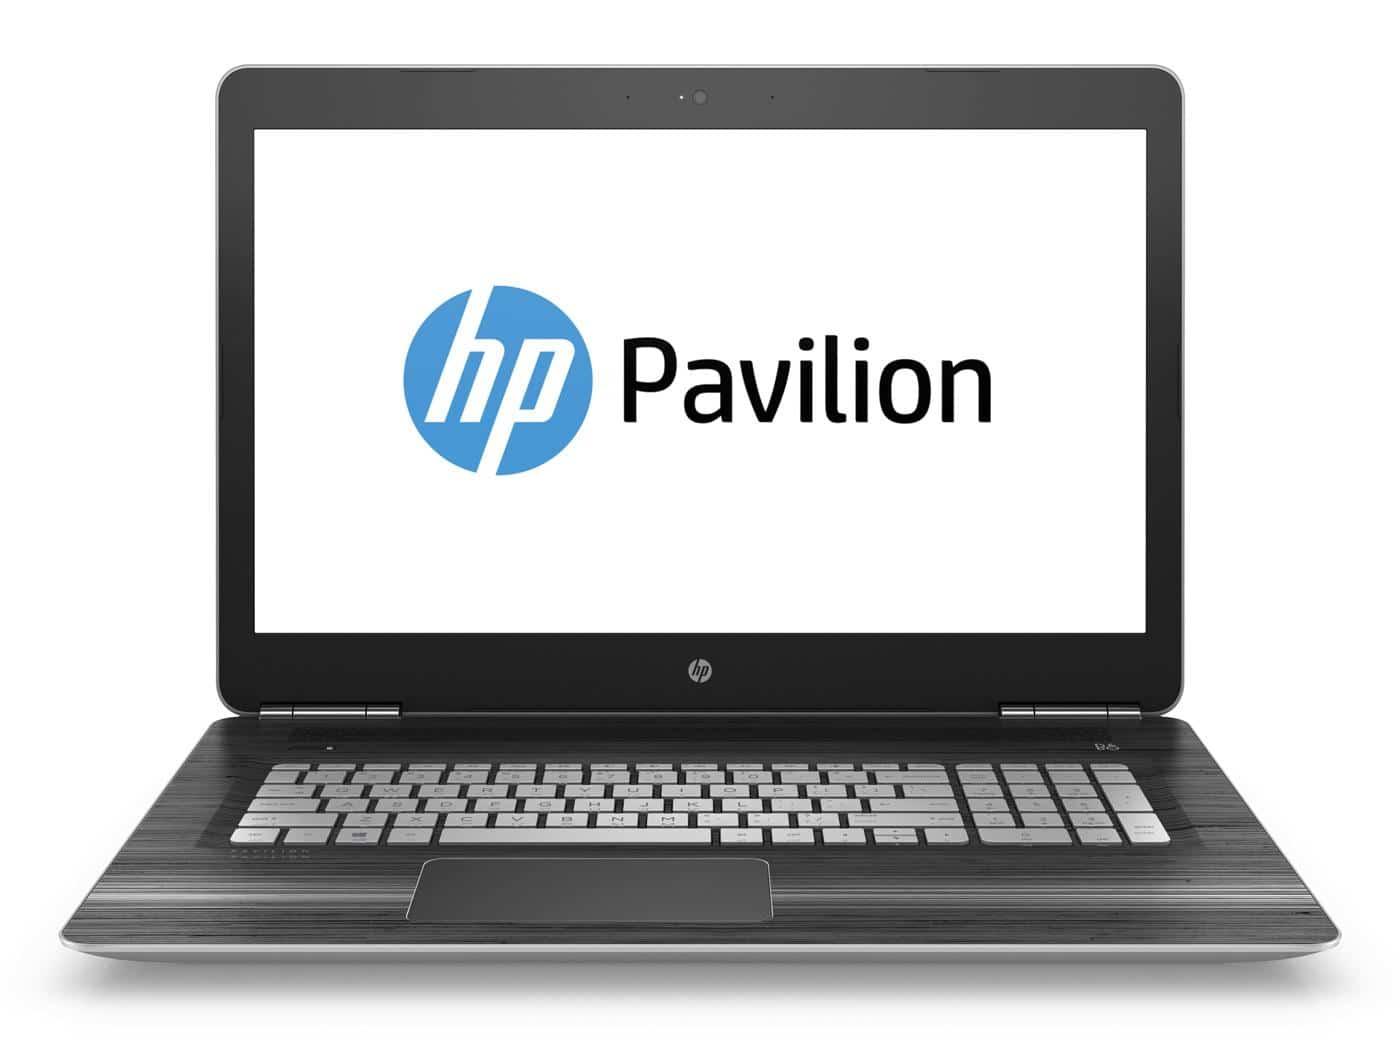 "<span class=""toptagtitre""><del>Promo 990€ ! </span></del>HP Pavilion 17-ab206nf, PC 17 pouces SSD Quad i7 GTX 1050 Full IPS"